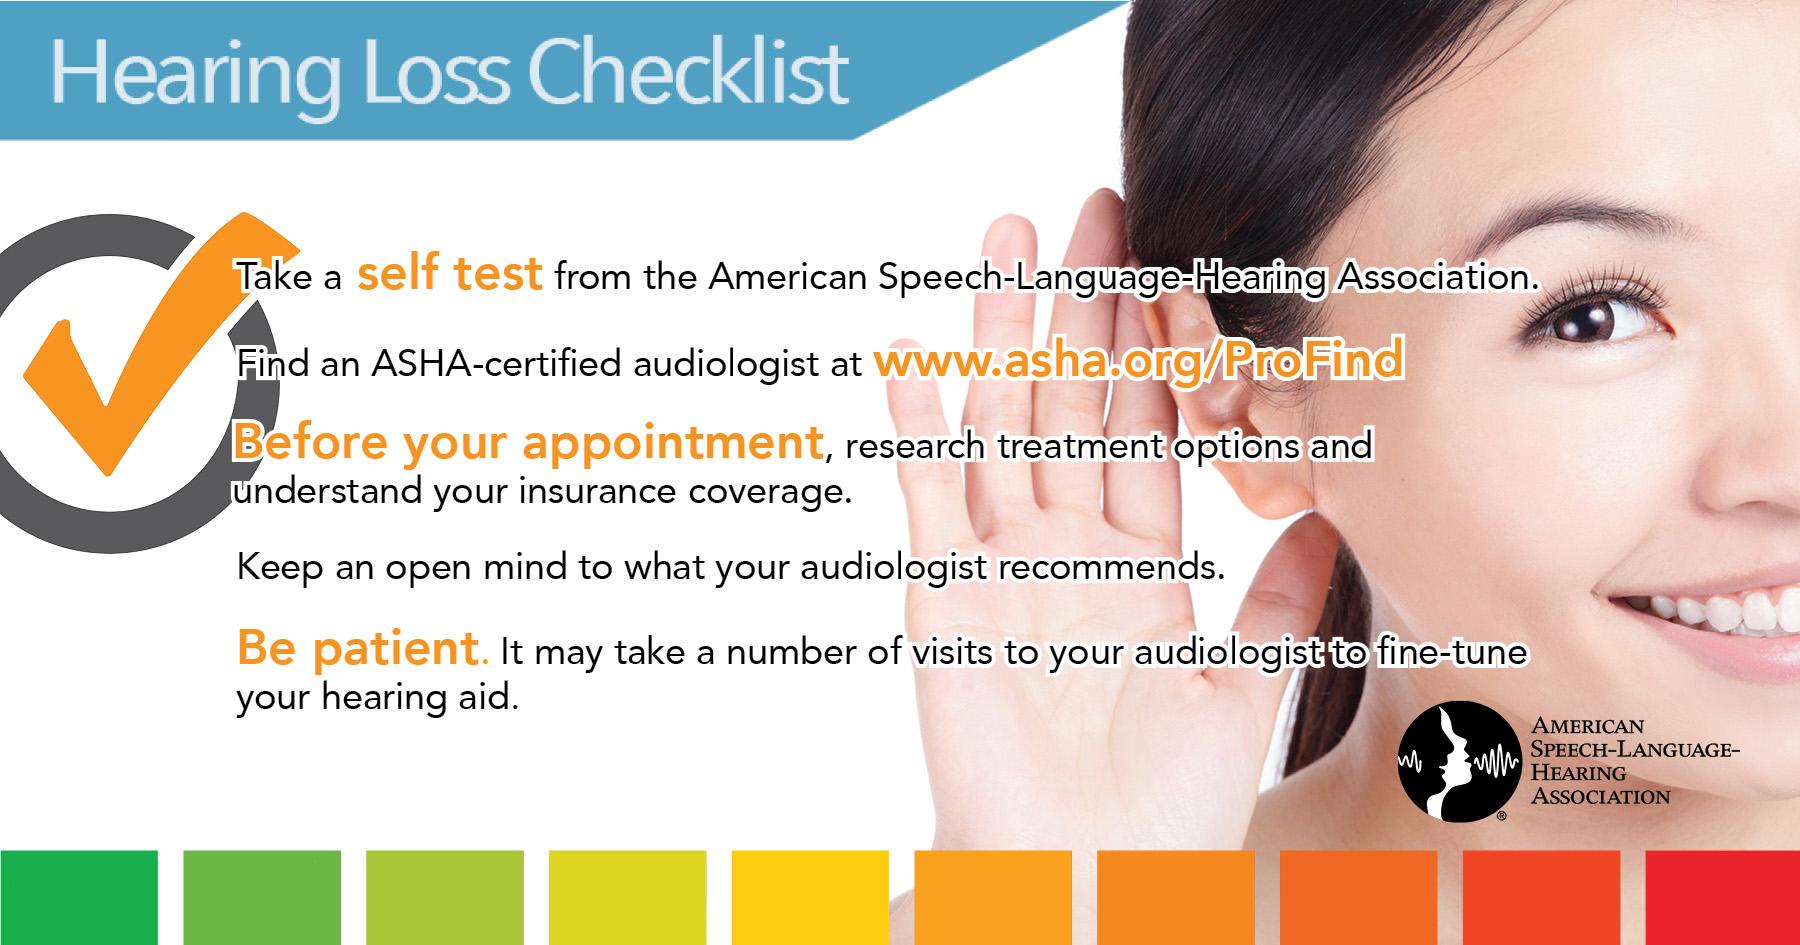 Hearing Loss Checklist